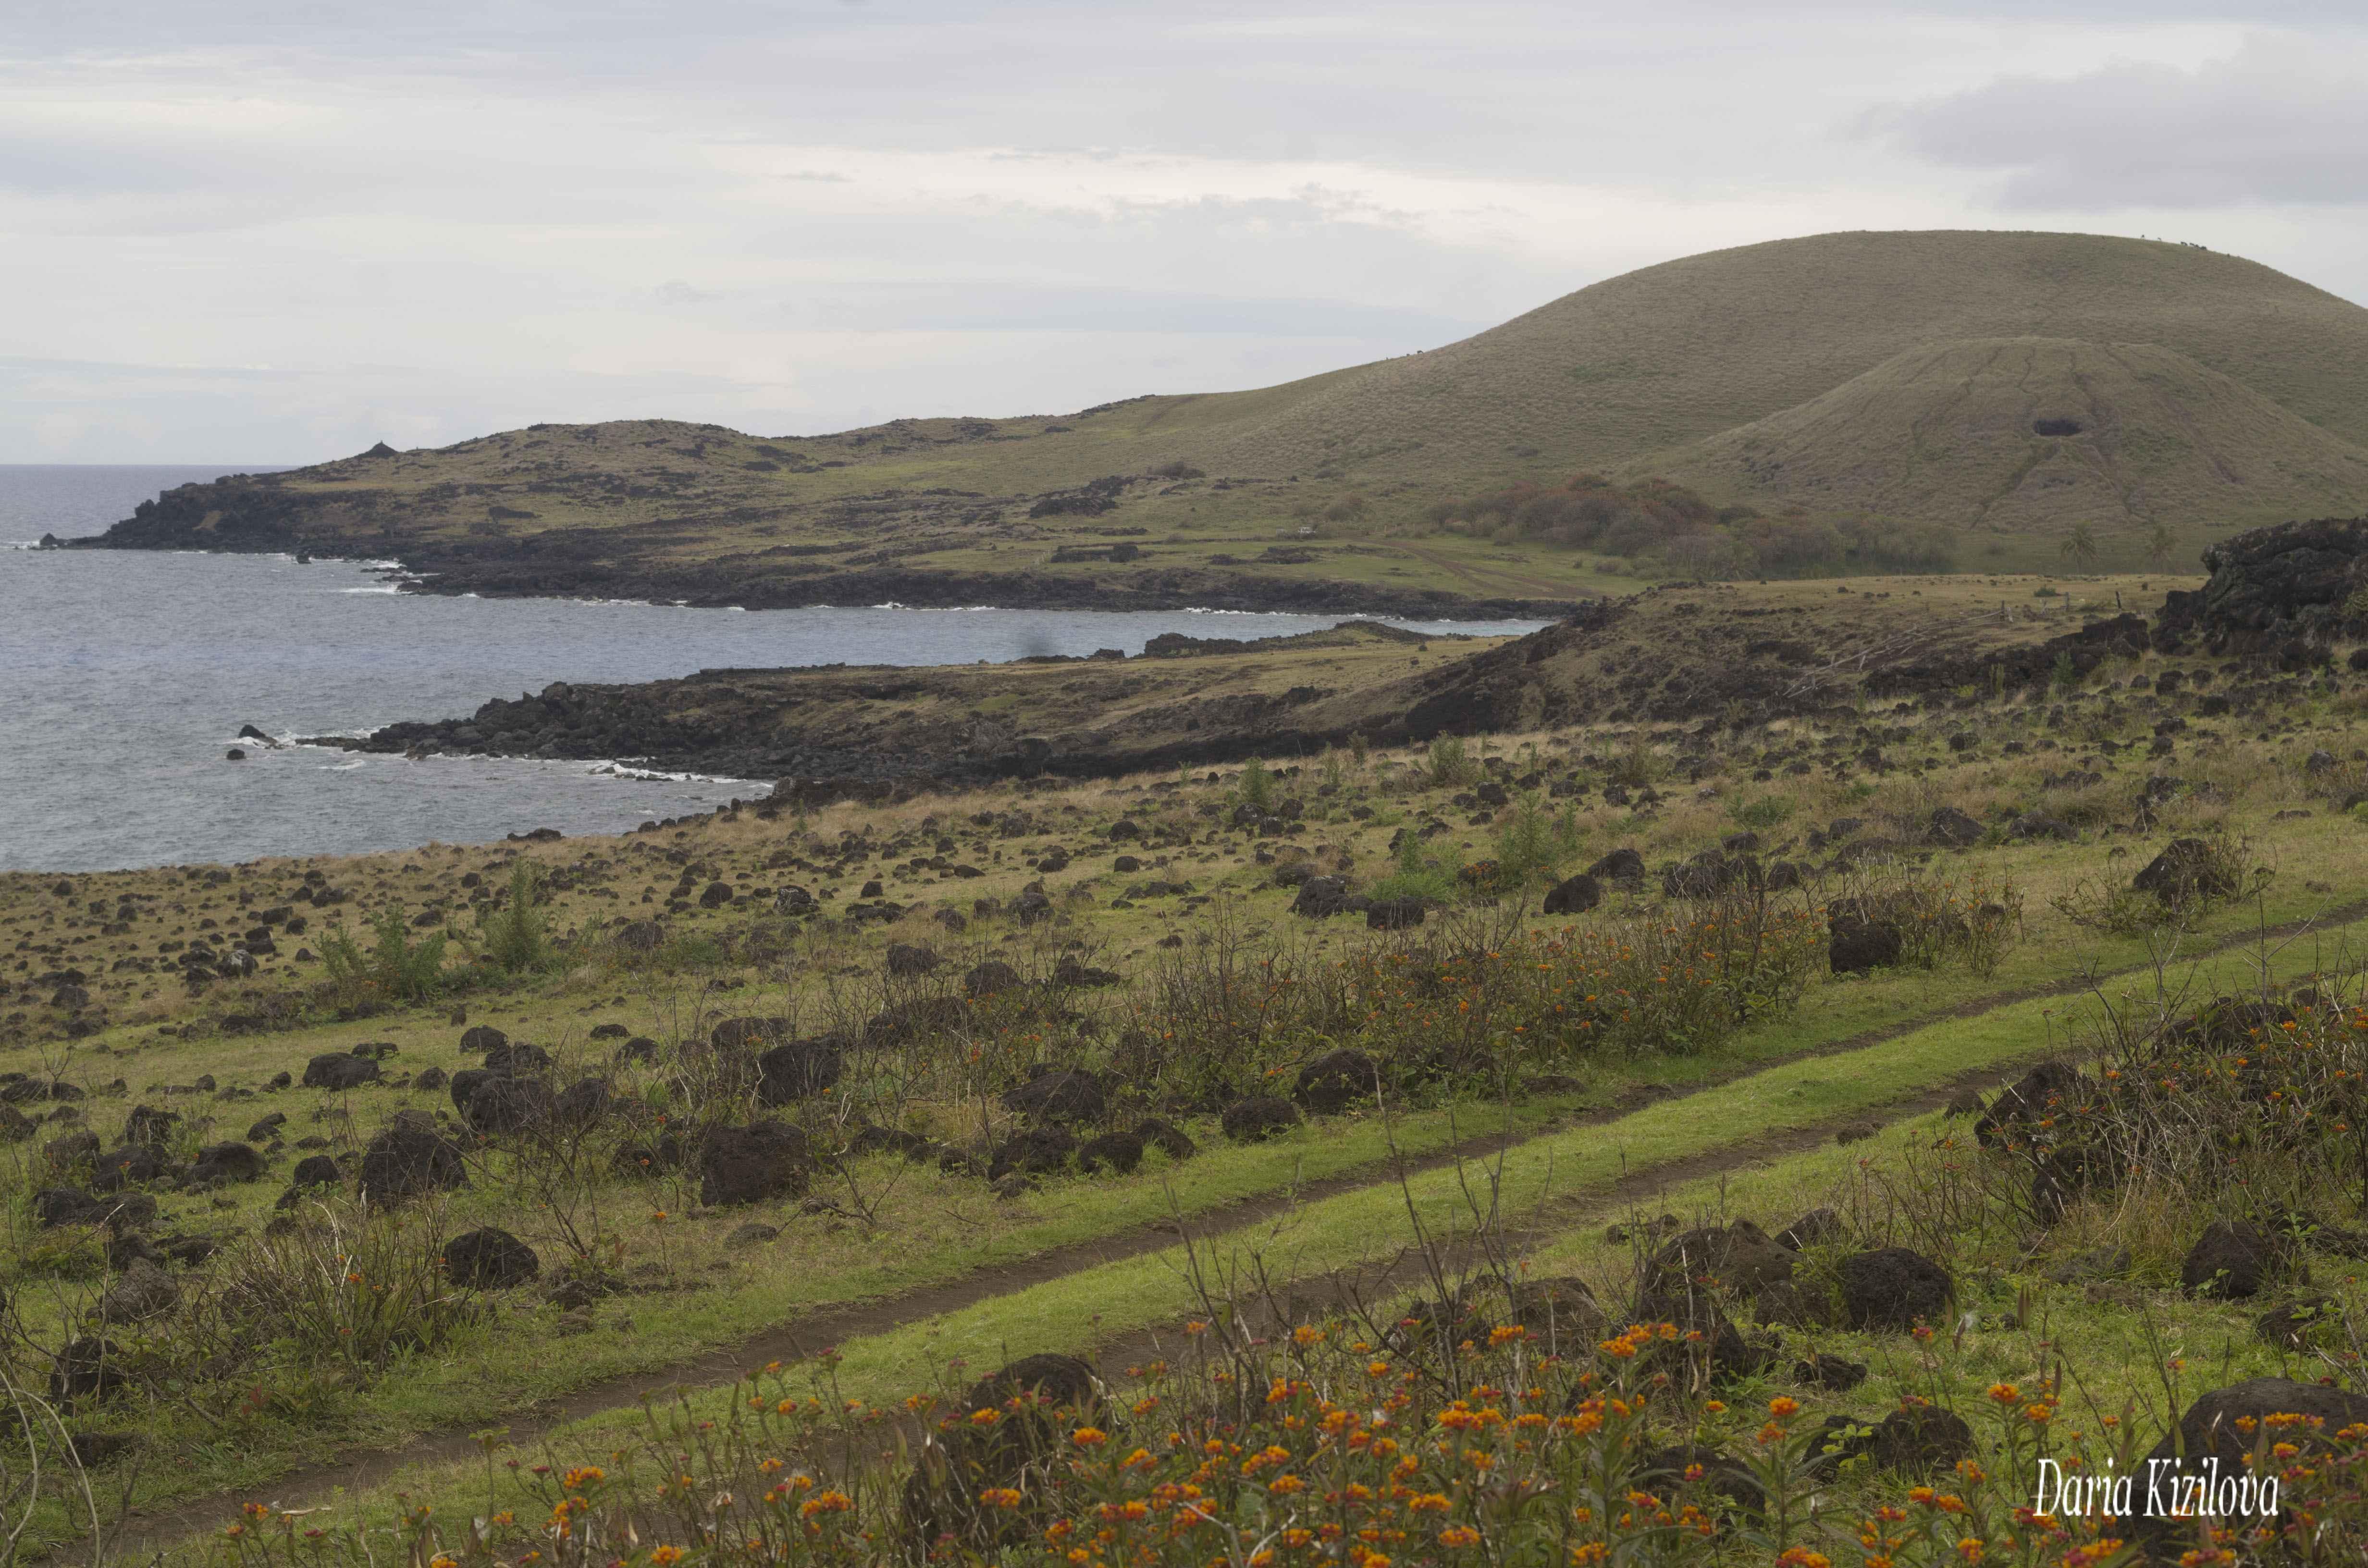 Rapa Nui Tourism